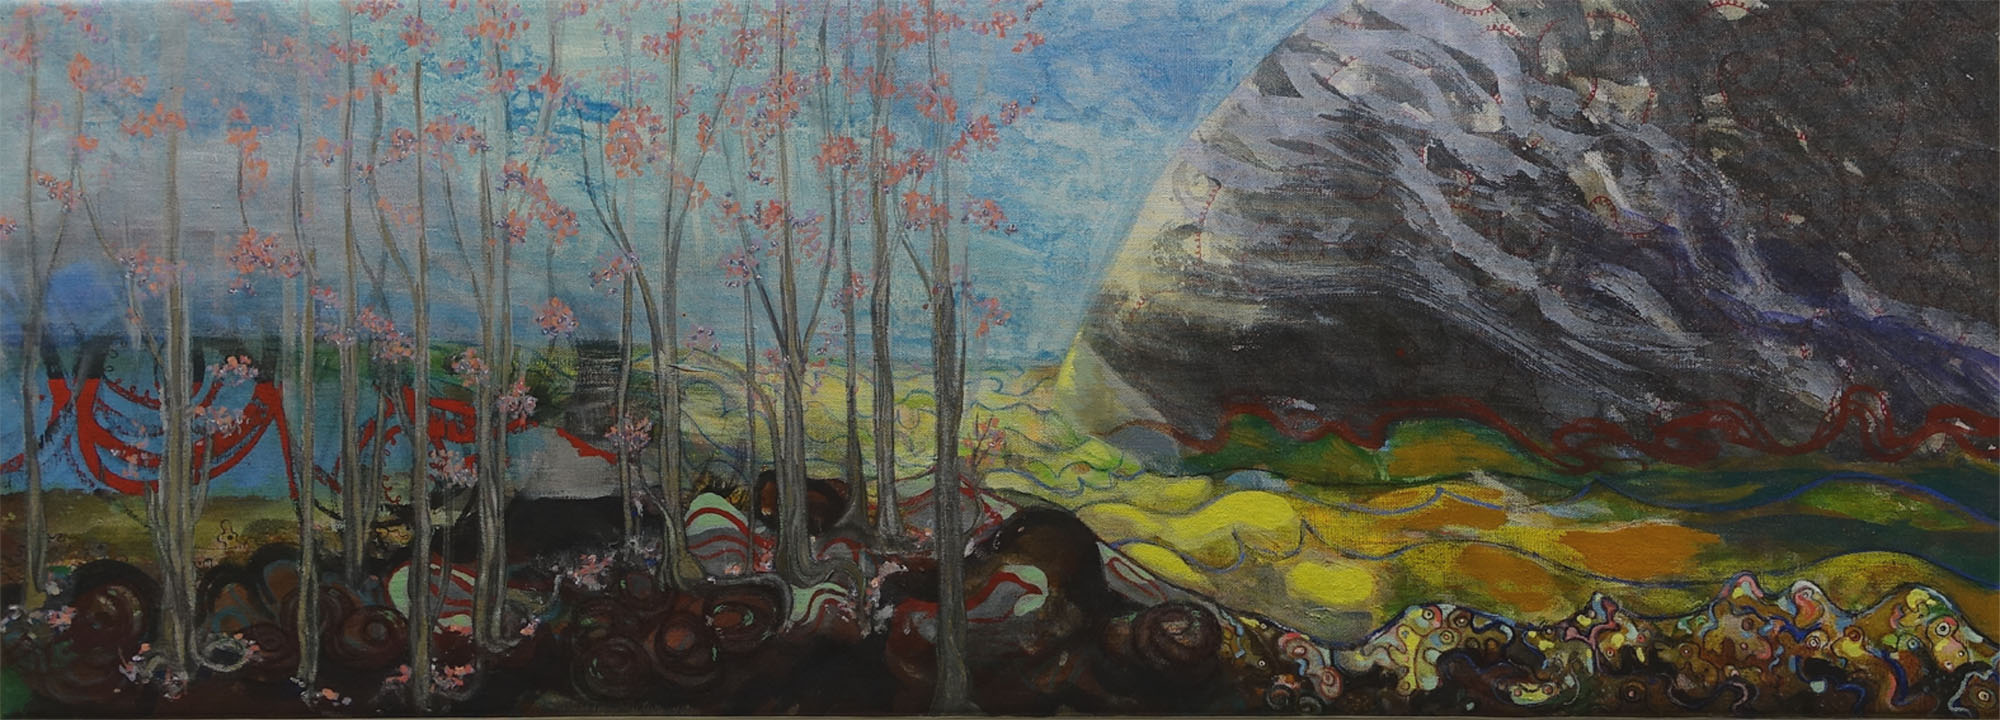 Elisabeth Fux Mattig, One Life, Winter